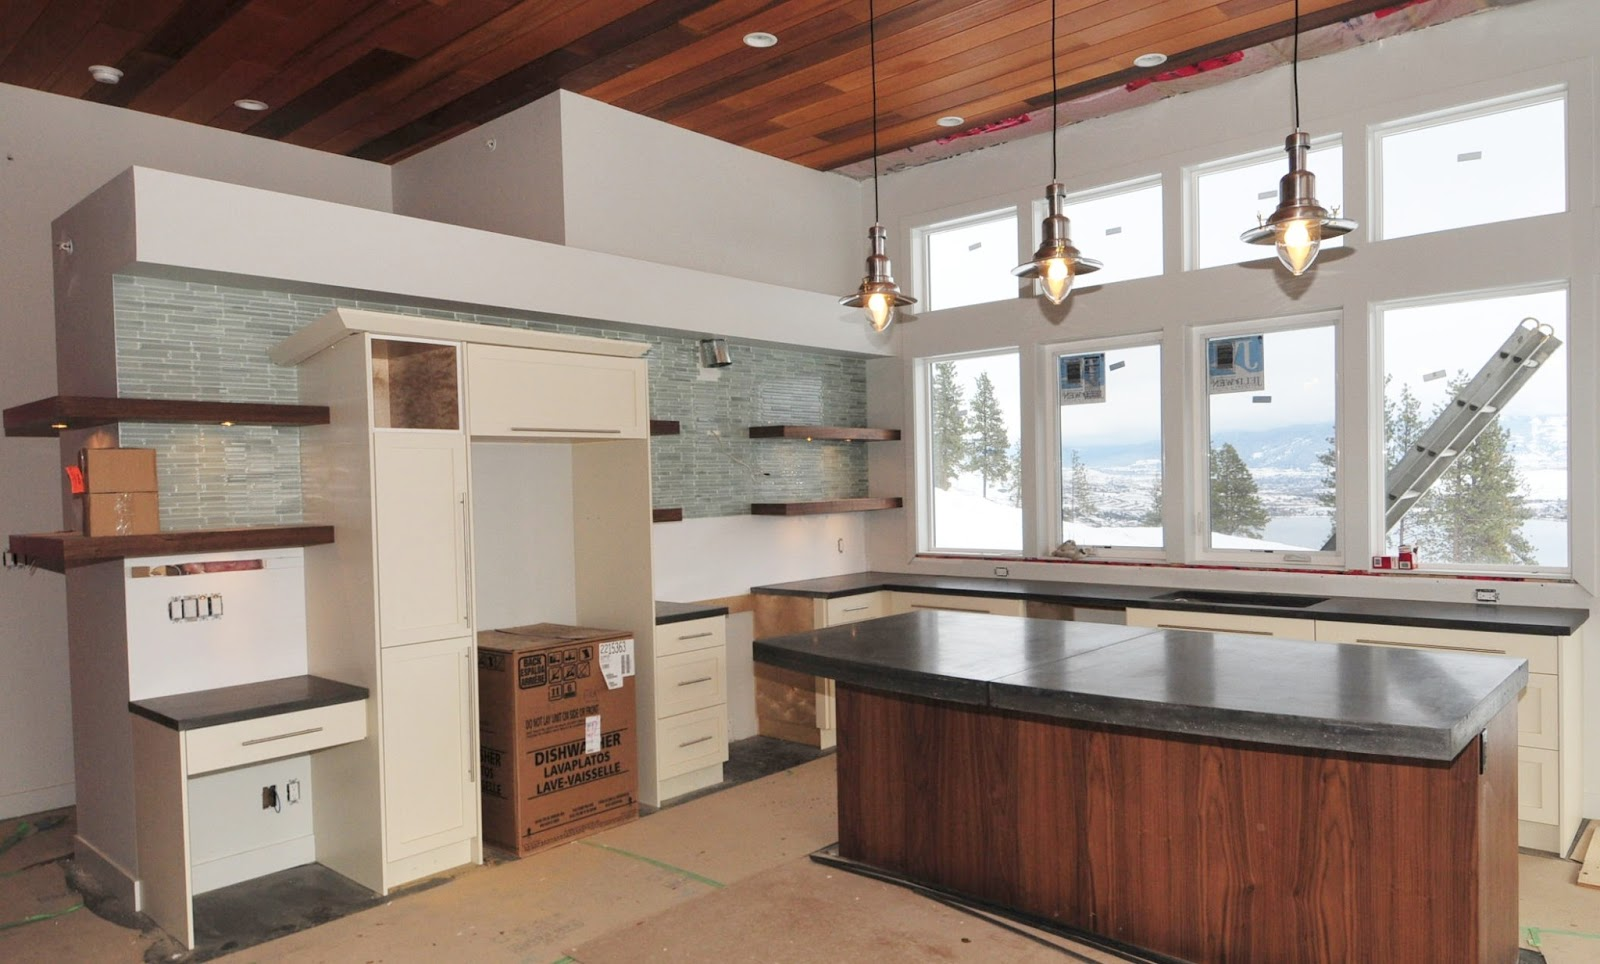 contemporary concrete kitchen concrete kitchen countertops MODE CONCRETE Modern Kitchen with Concrete Countertops made in the Okanagan by MODE CONCRETE